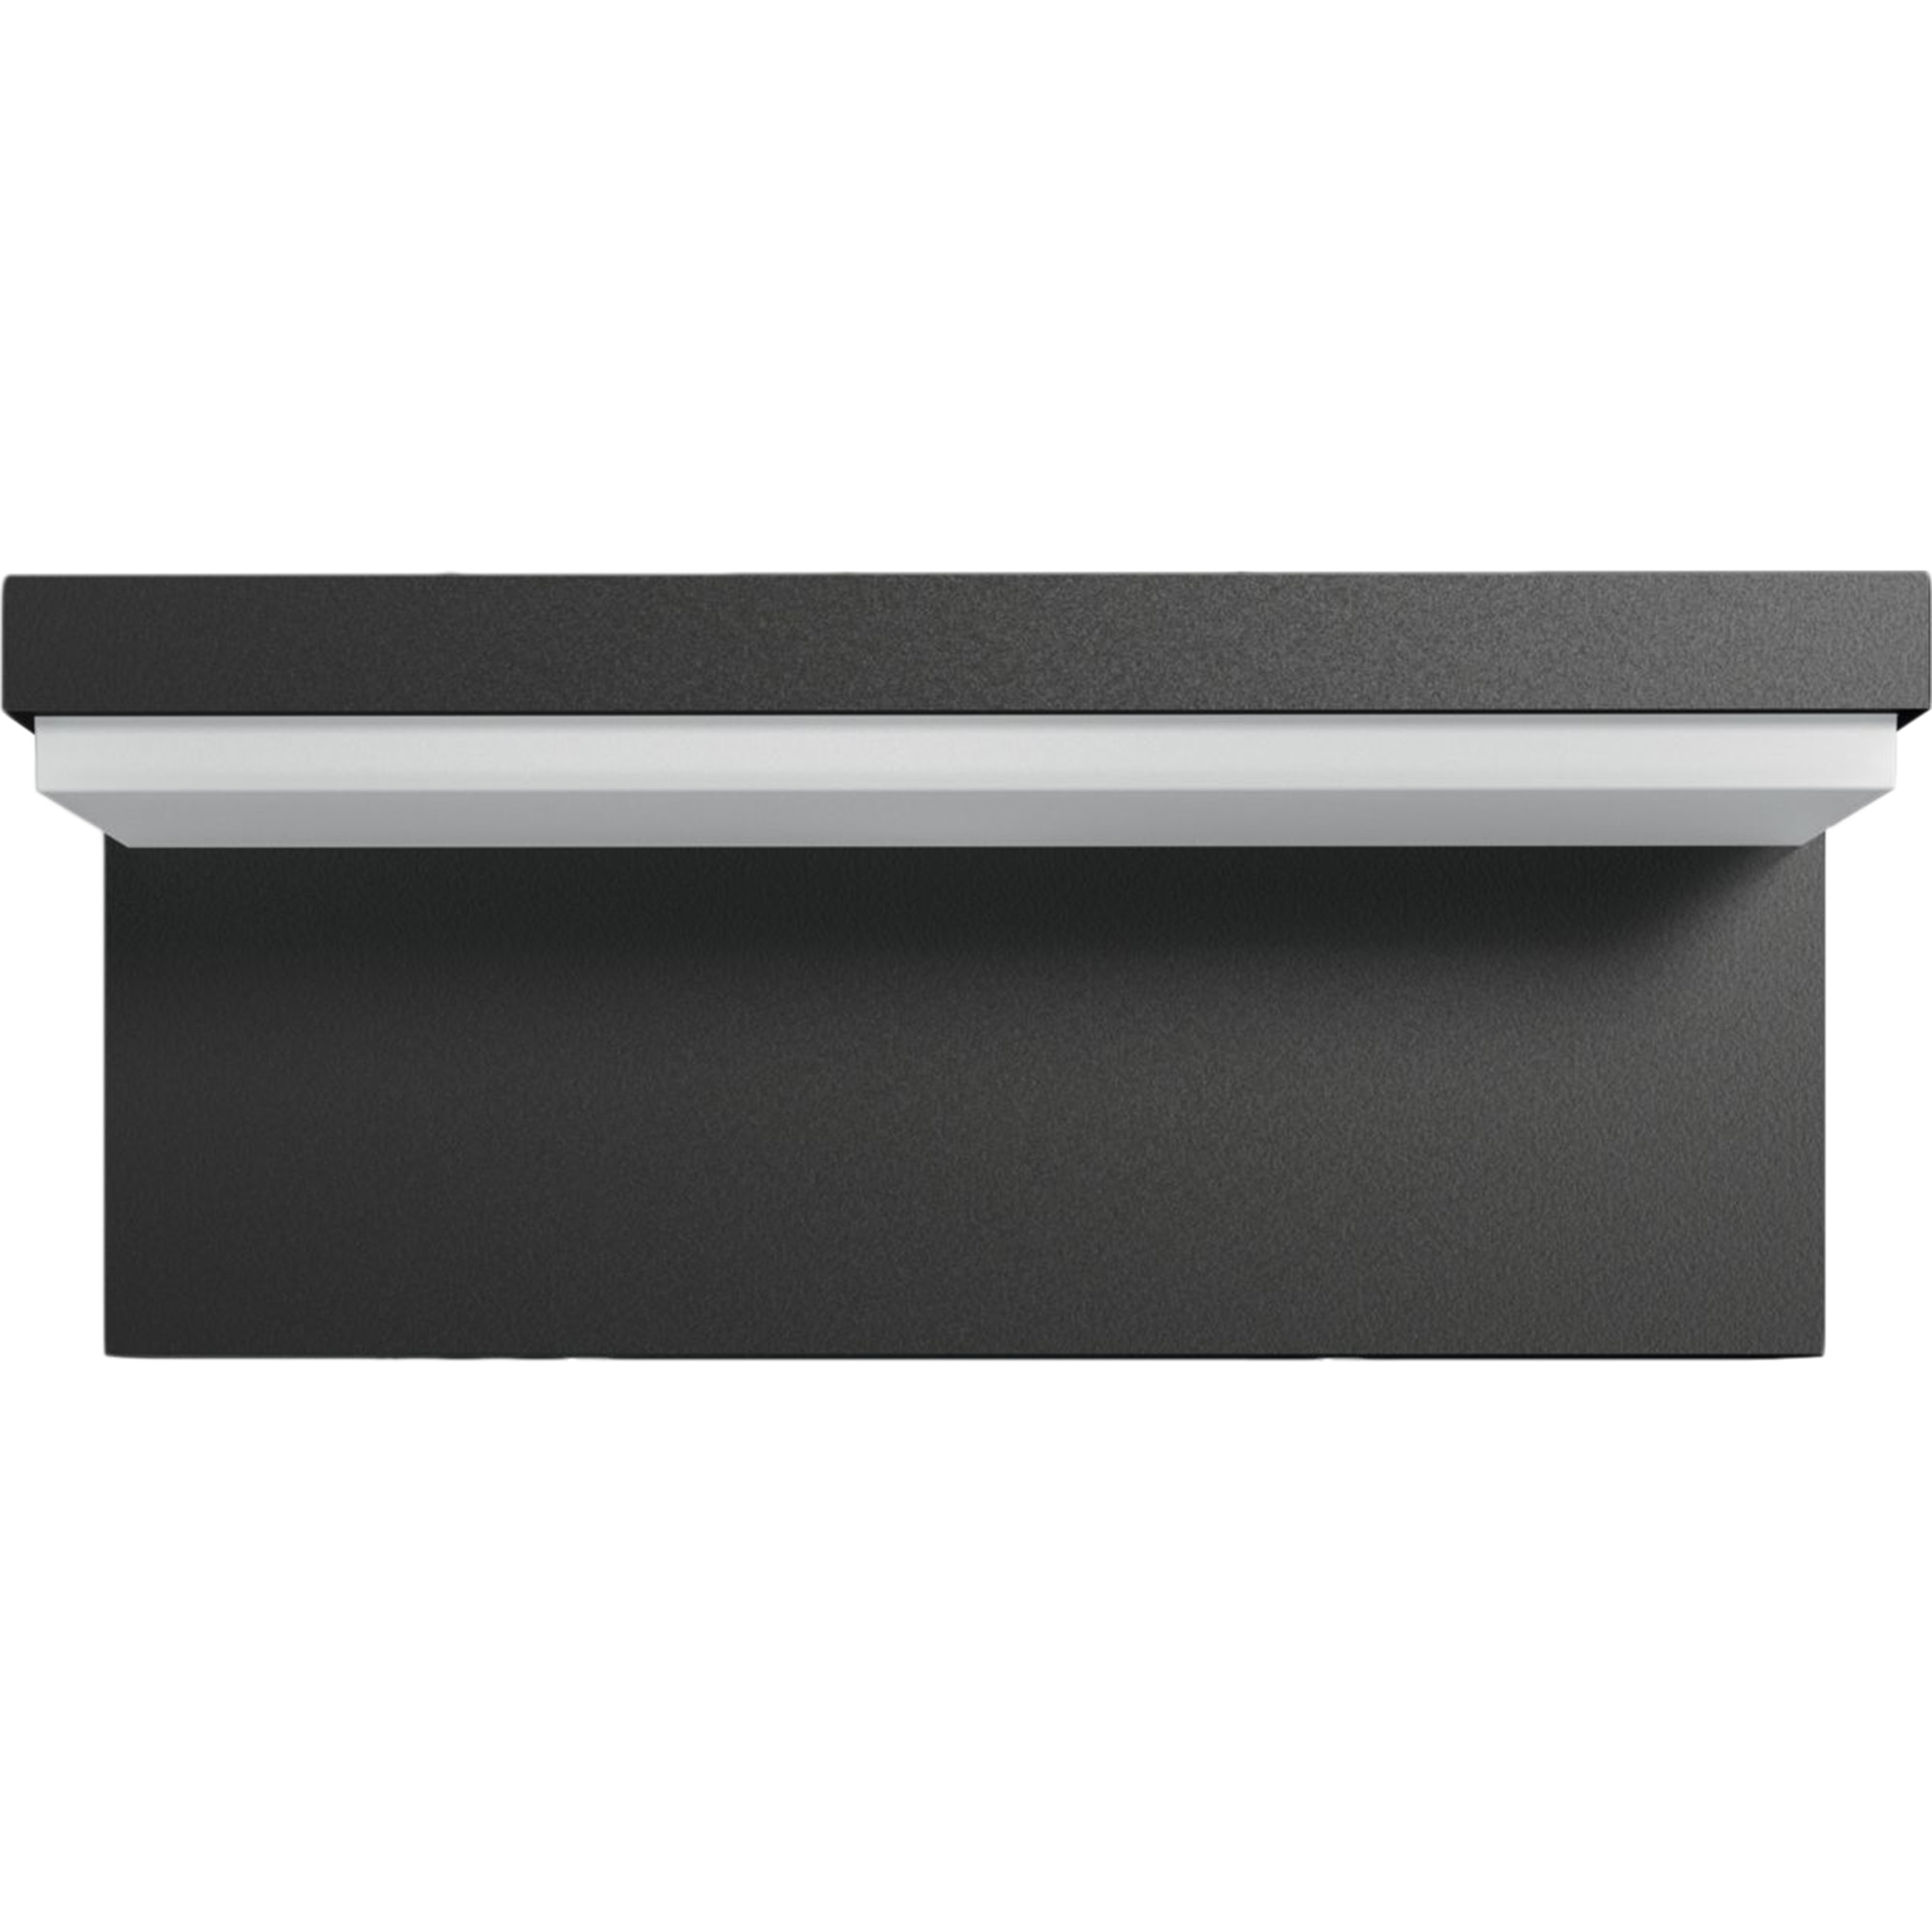 Fotografie Aplica LED integrat pentru exterior Philips myGarden Bustan, 2x4.5W, 4000K, IP44, Gri inchis